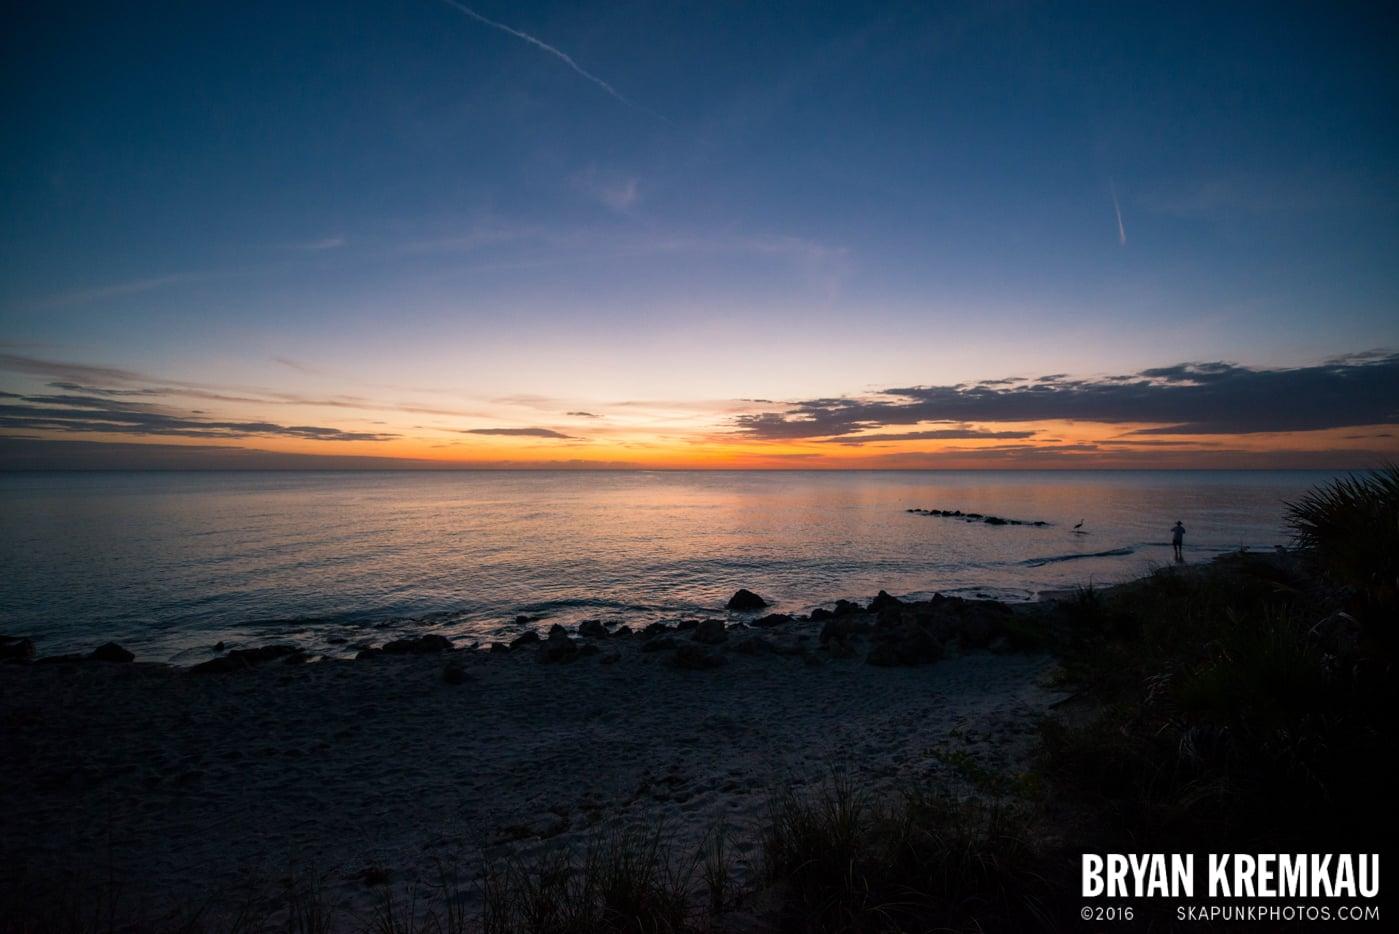 Sunsets, Astrophotography & Birds @ Venice, Florida - 10.25.14 - 11.5.14 (56)